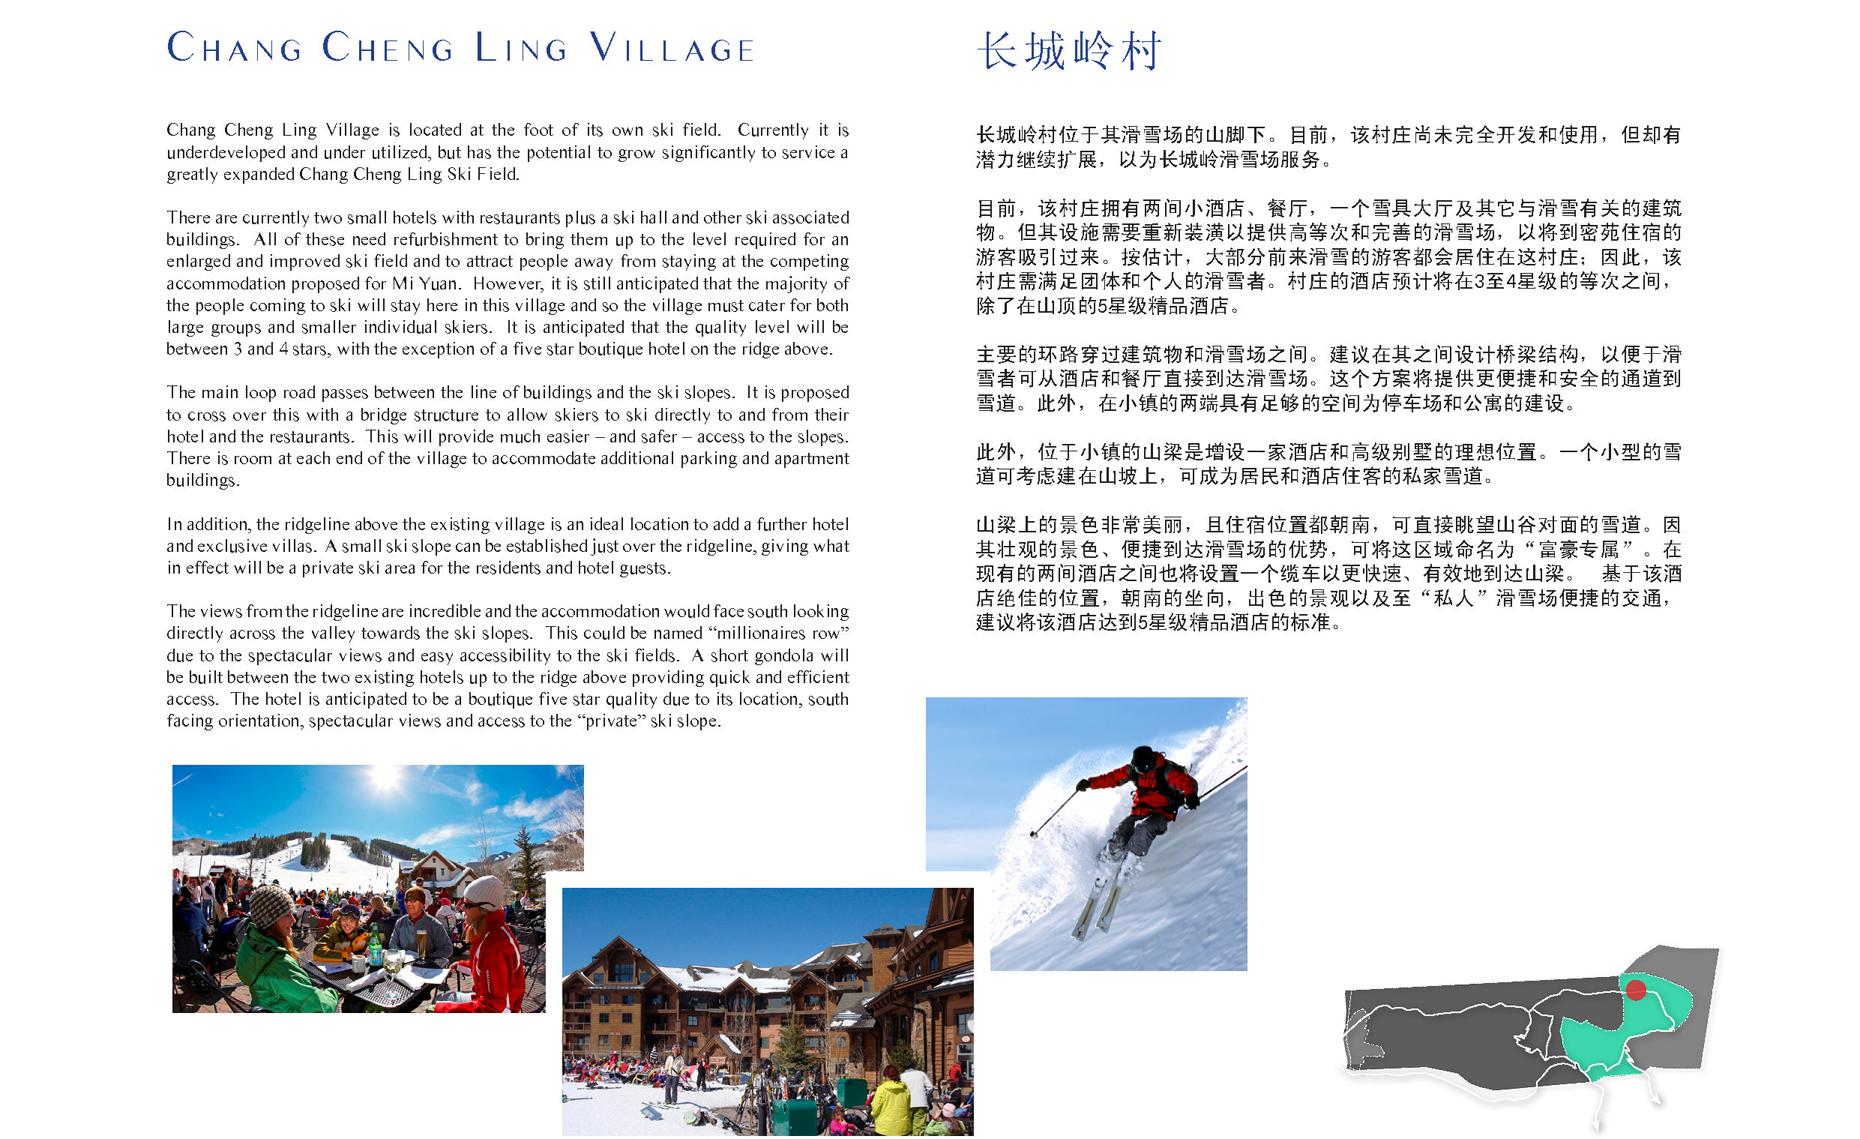 Chongli-China-Ski-Area-Design-4.jpg